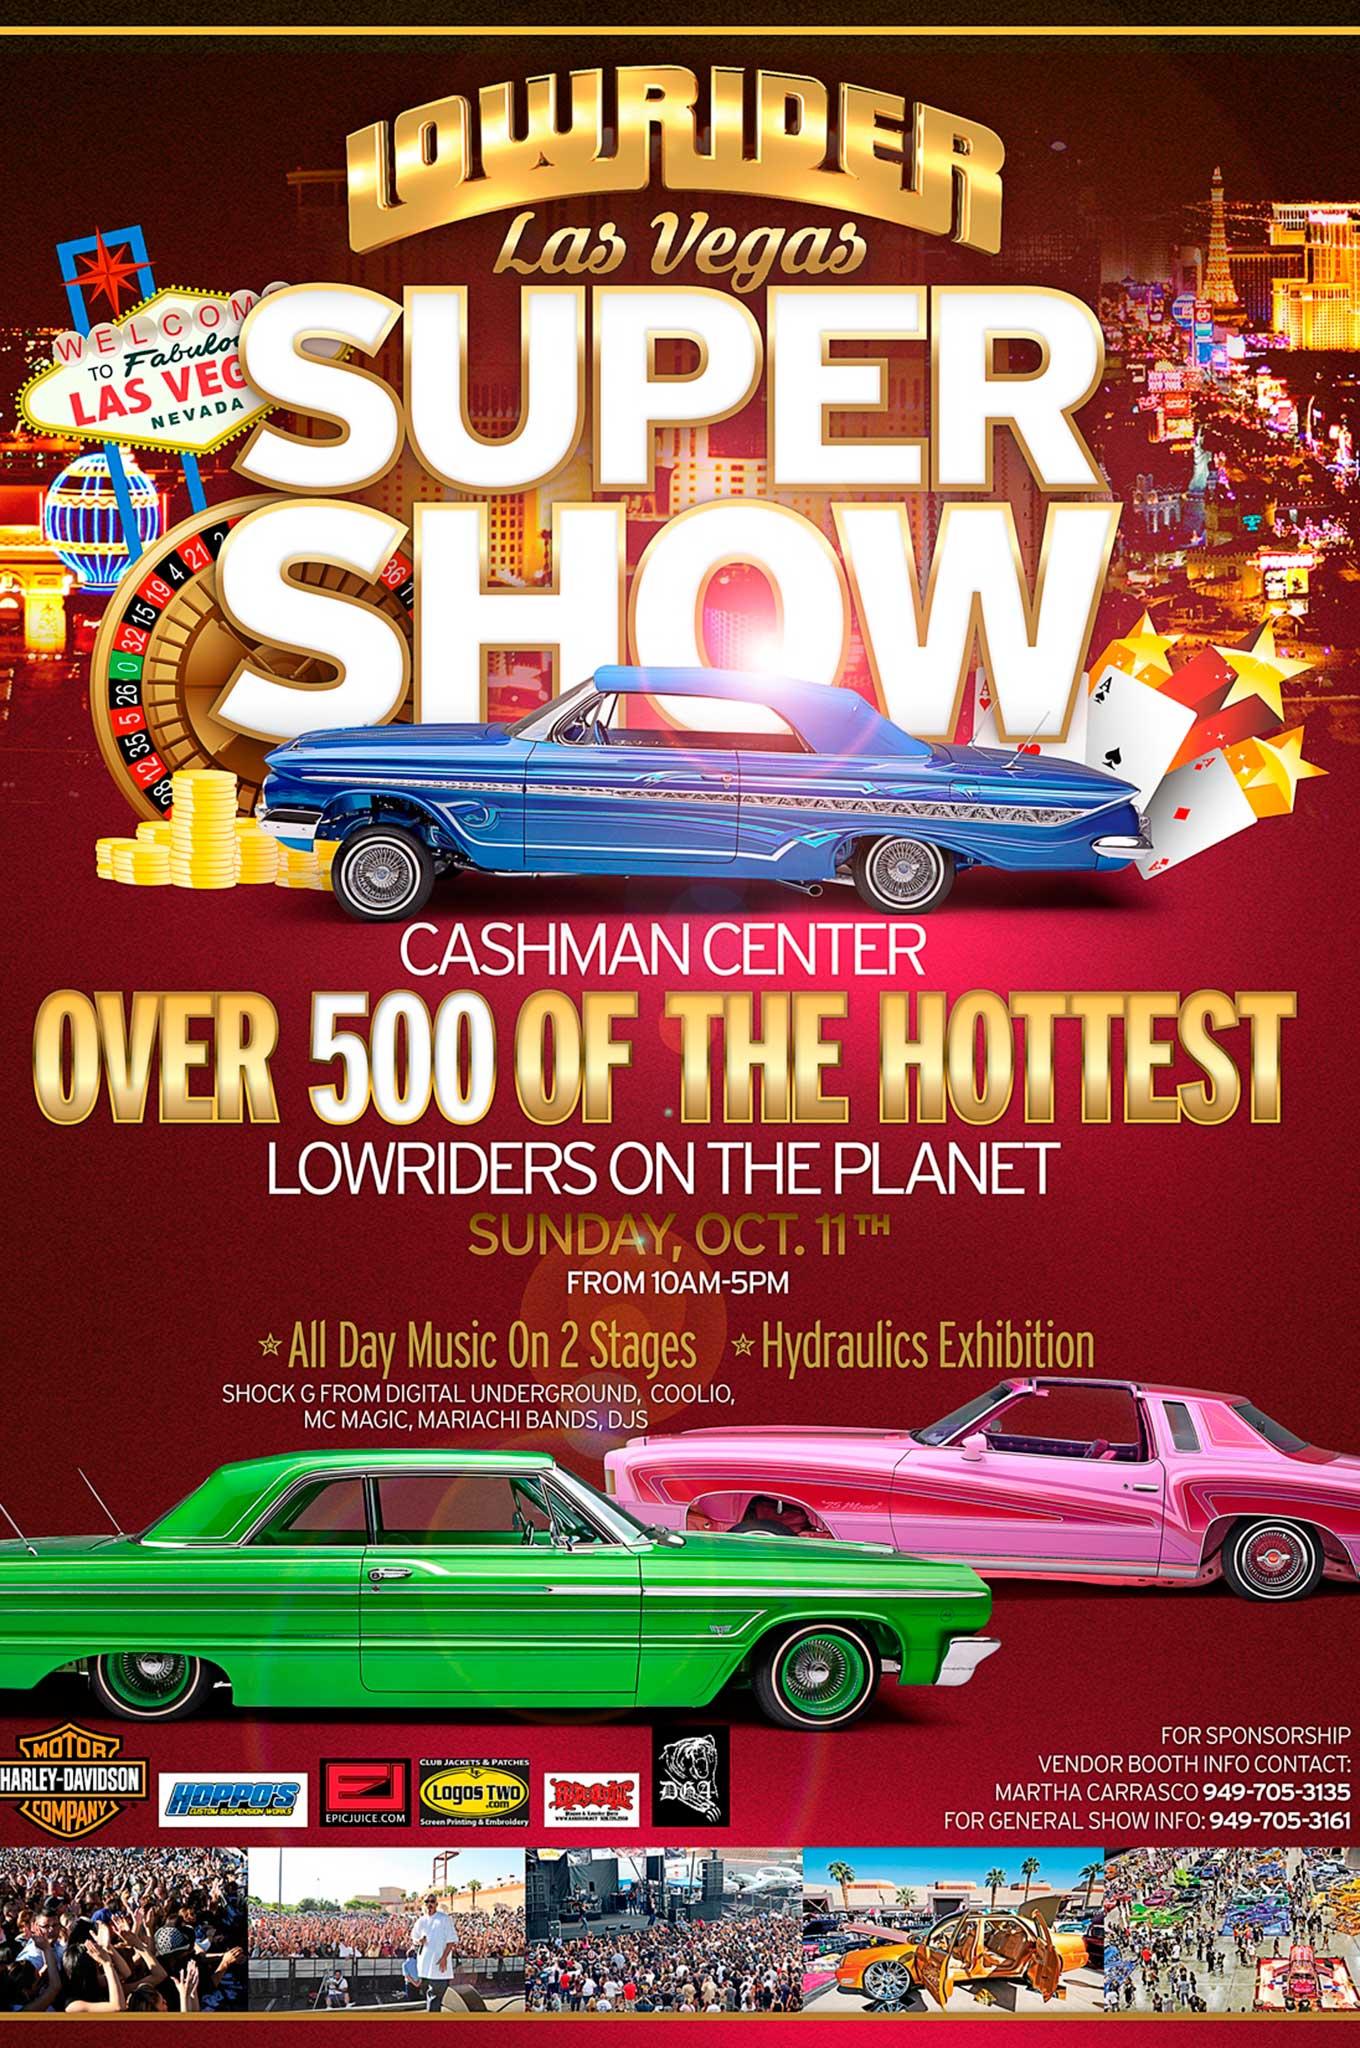 Las Vegas Super Show Lowrider - Lowrider car show las vegas